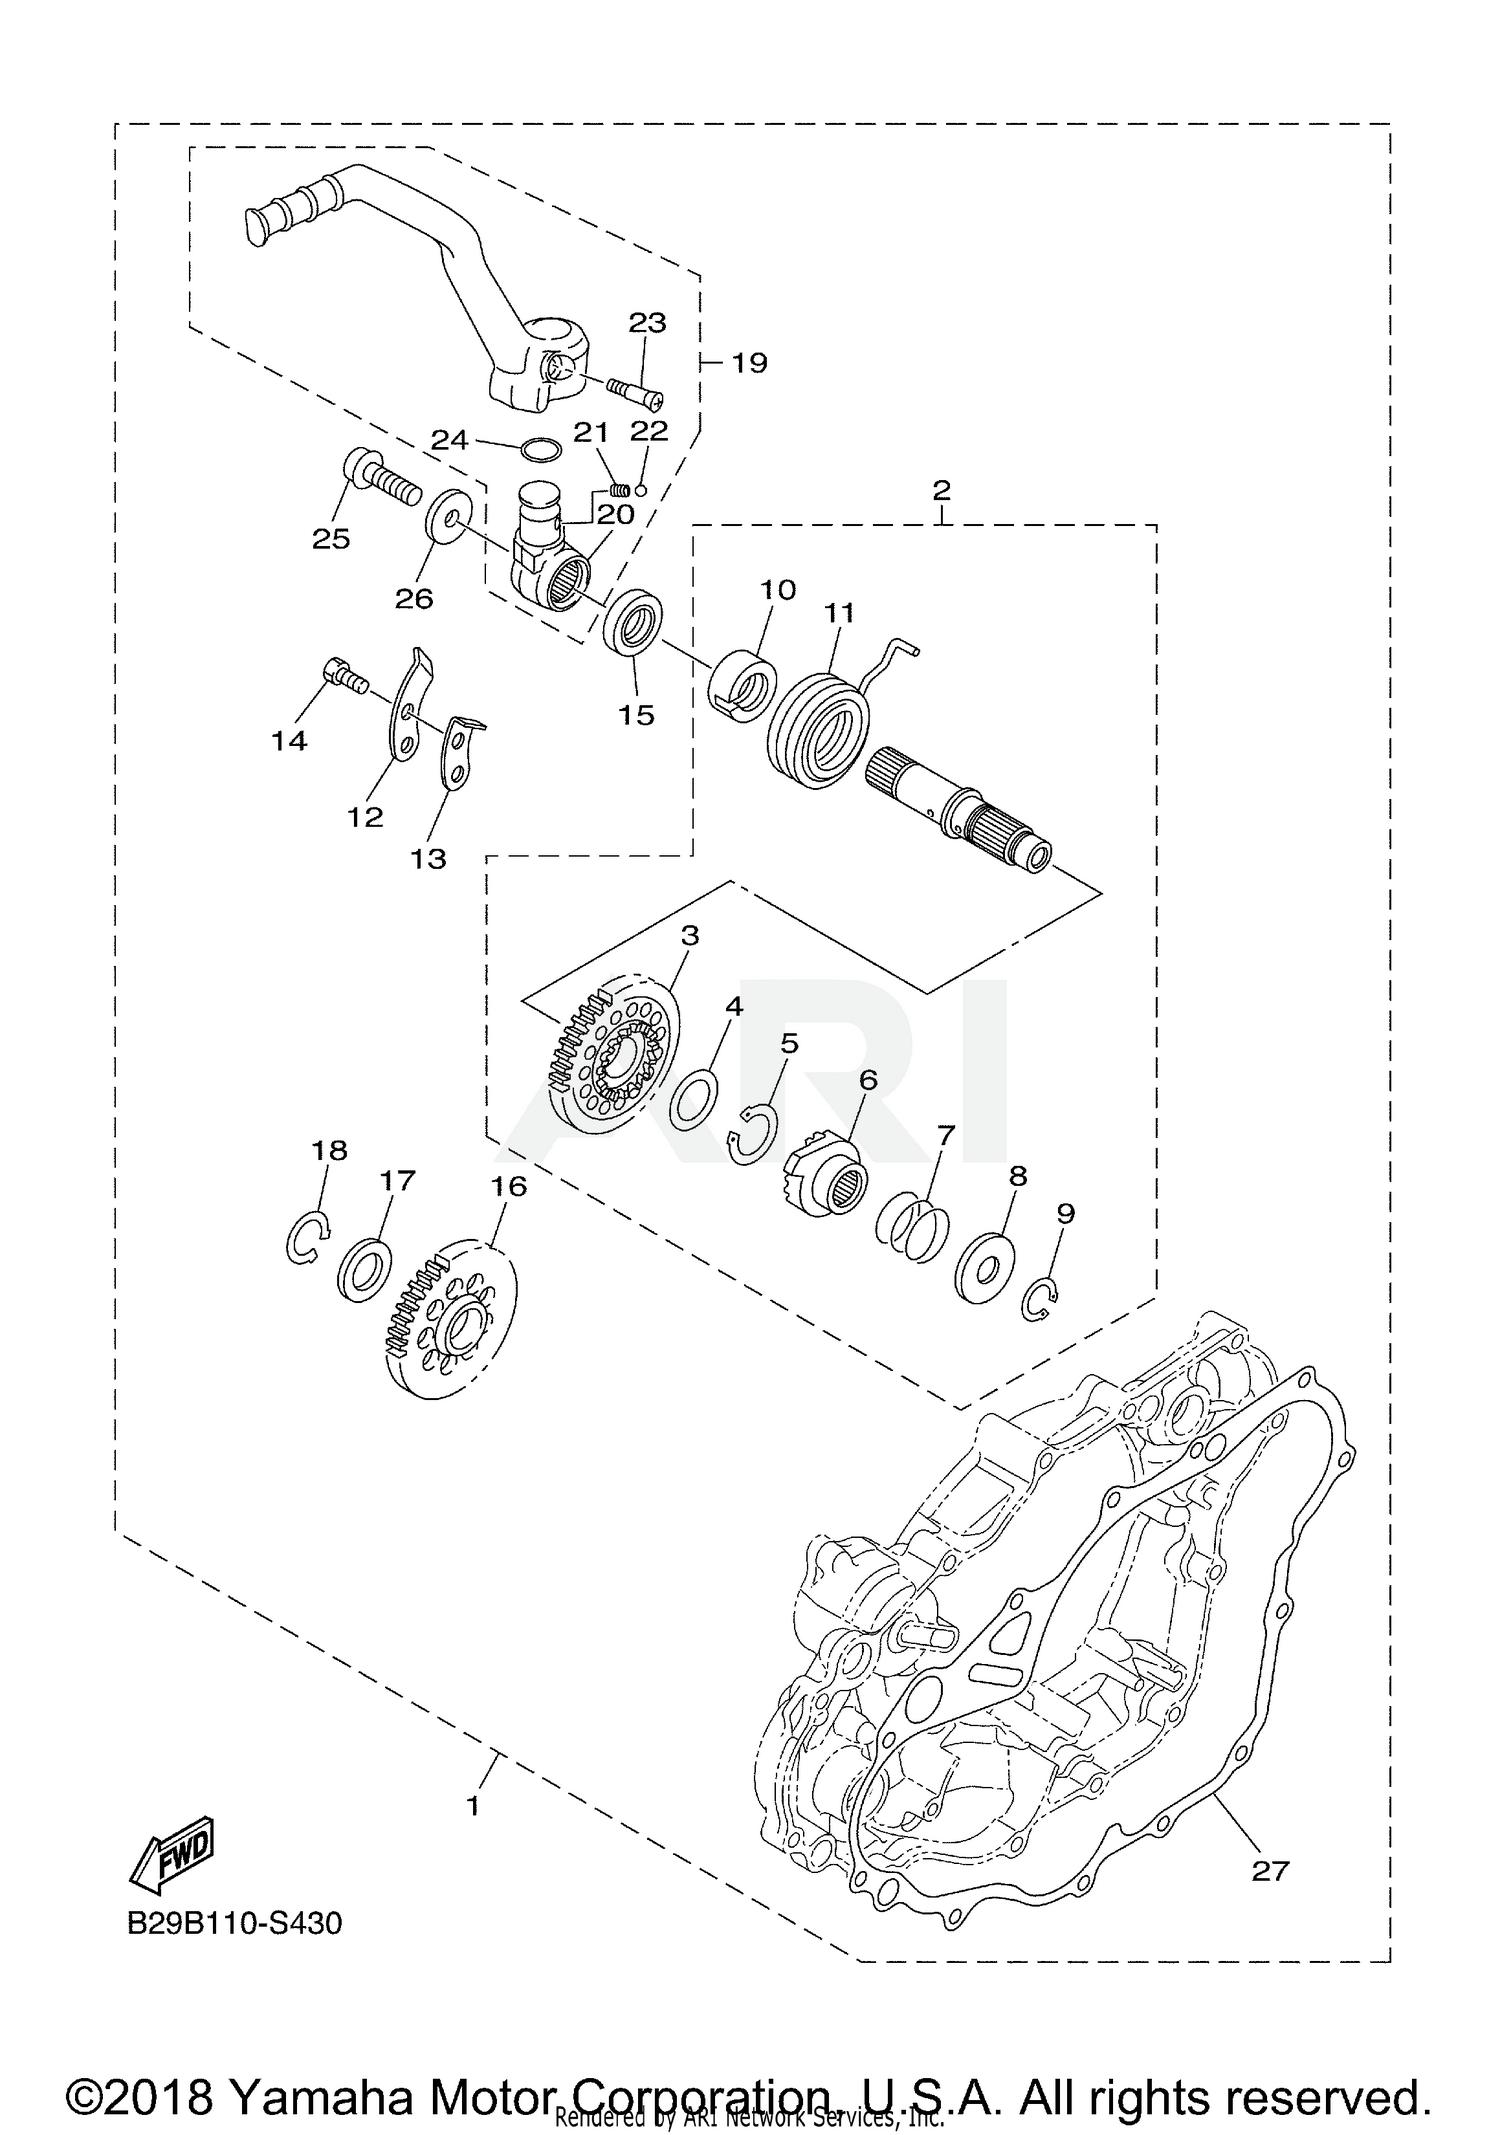 hight resolution of yamaha wr250f diagram wiring diagram go 2006 wr250f wiring diagram 2018 yamaha wr250f wr250fj parts option